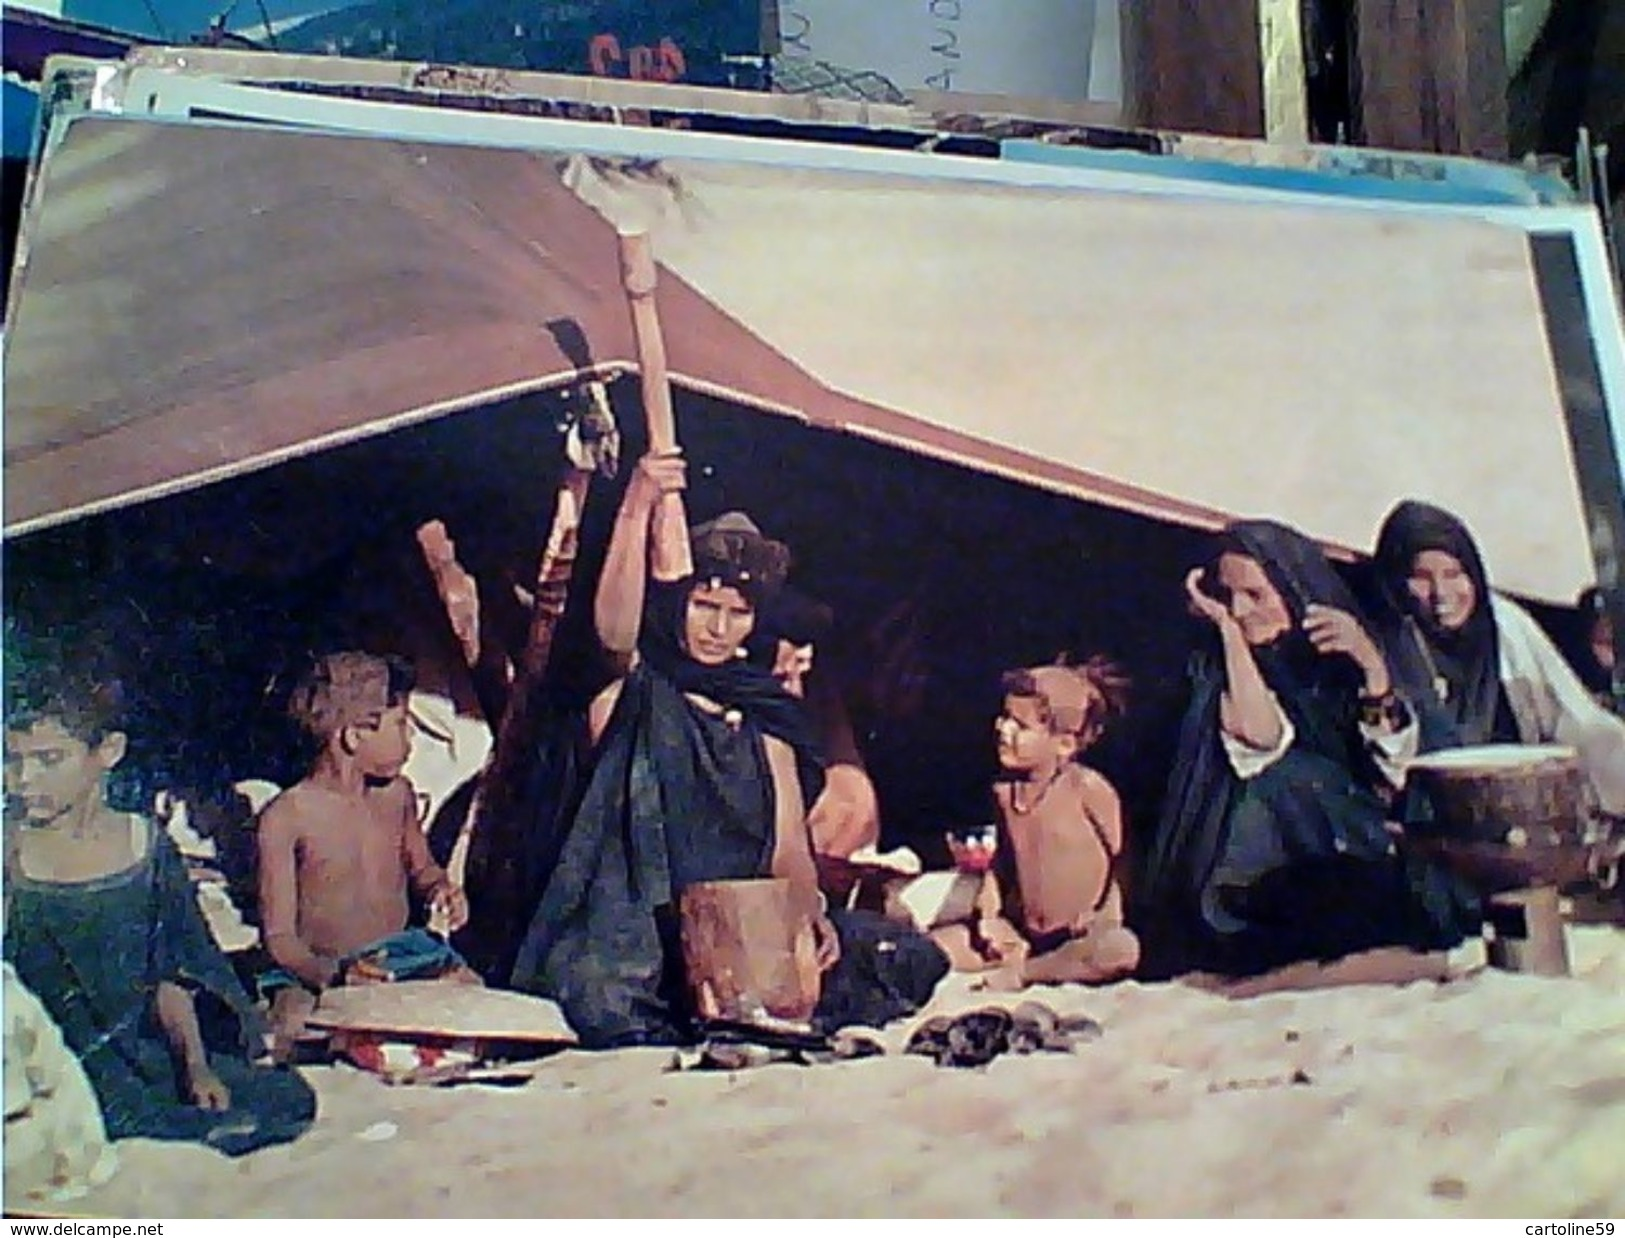 MAURITANIA VITA NOMADE  VITA SOTTO LA TENDA  N1975 GI17599 - Mauritania